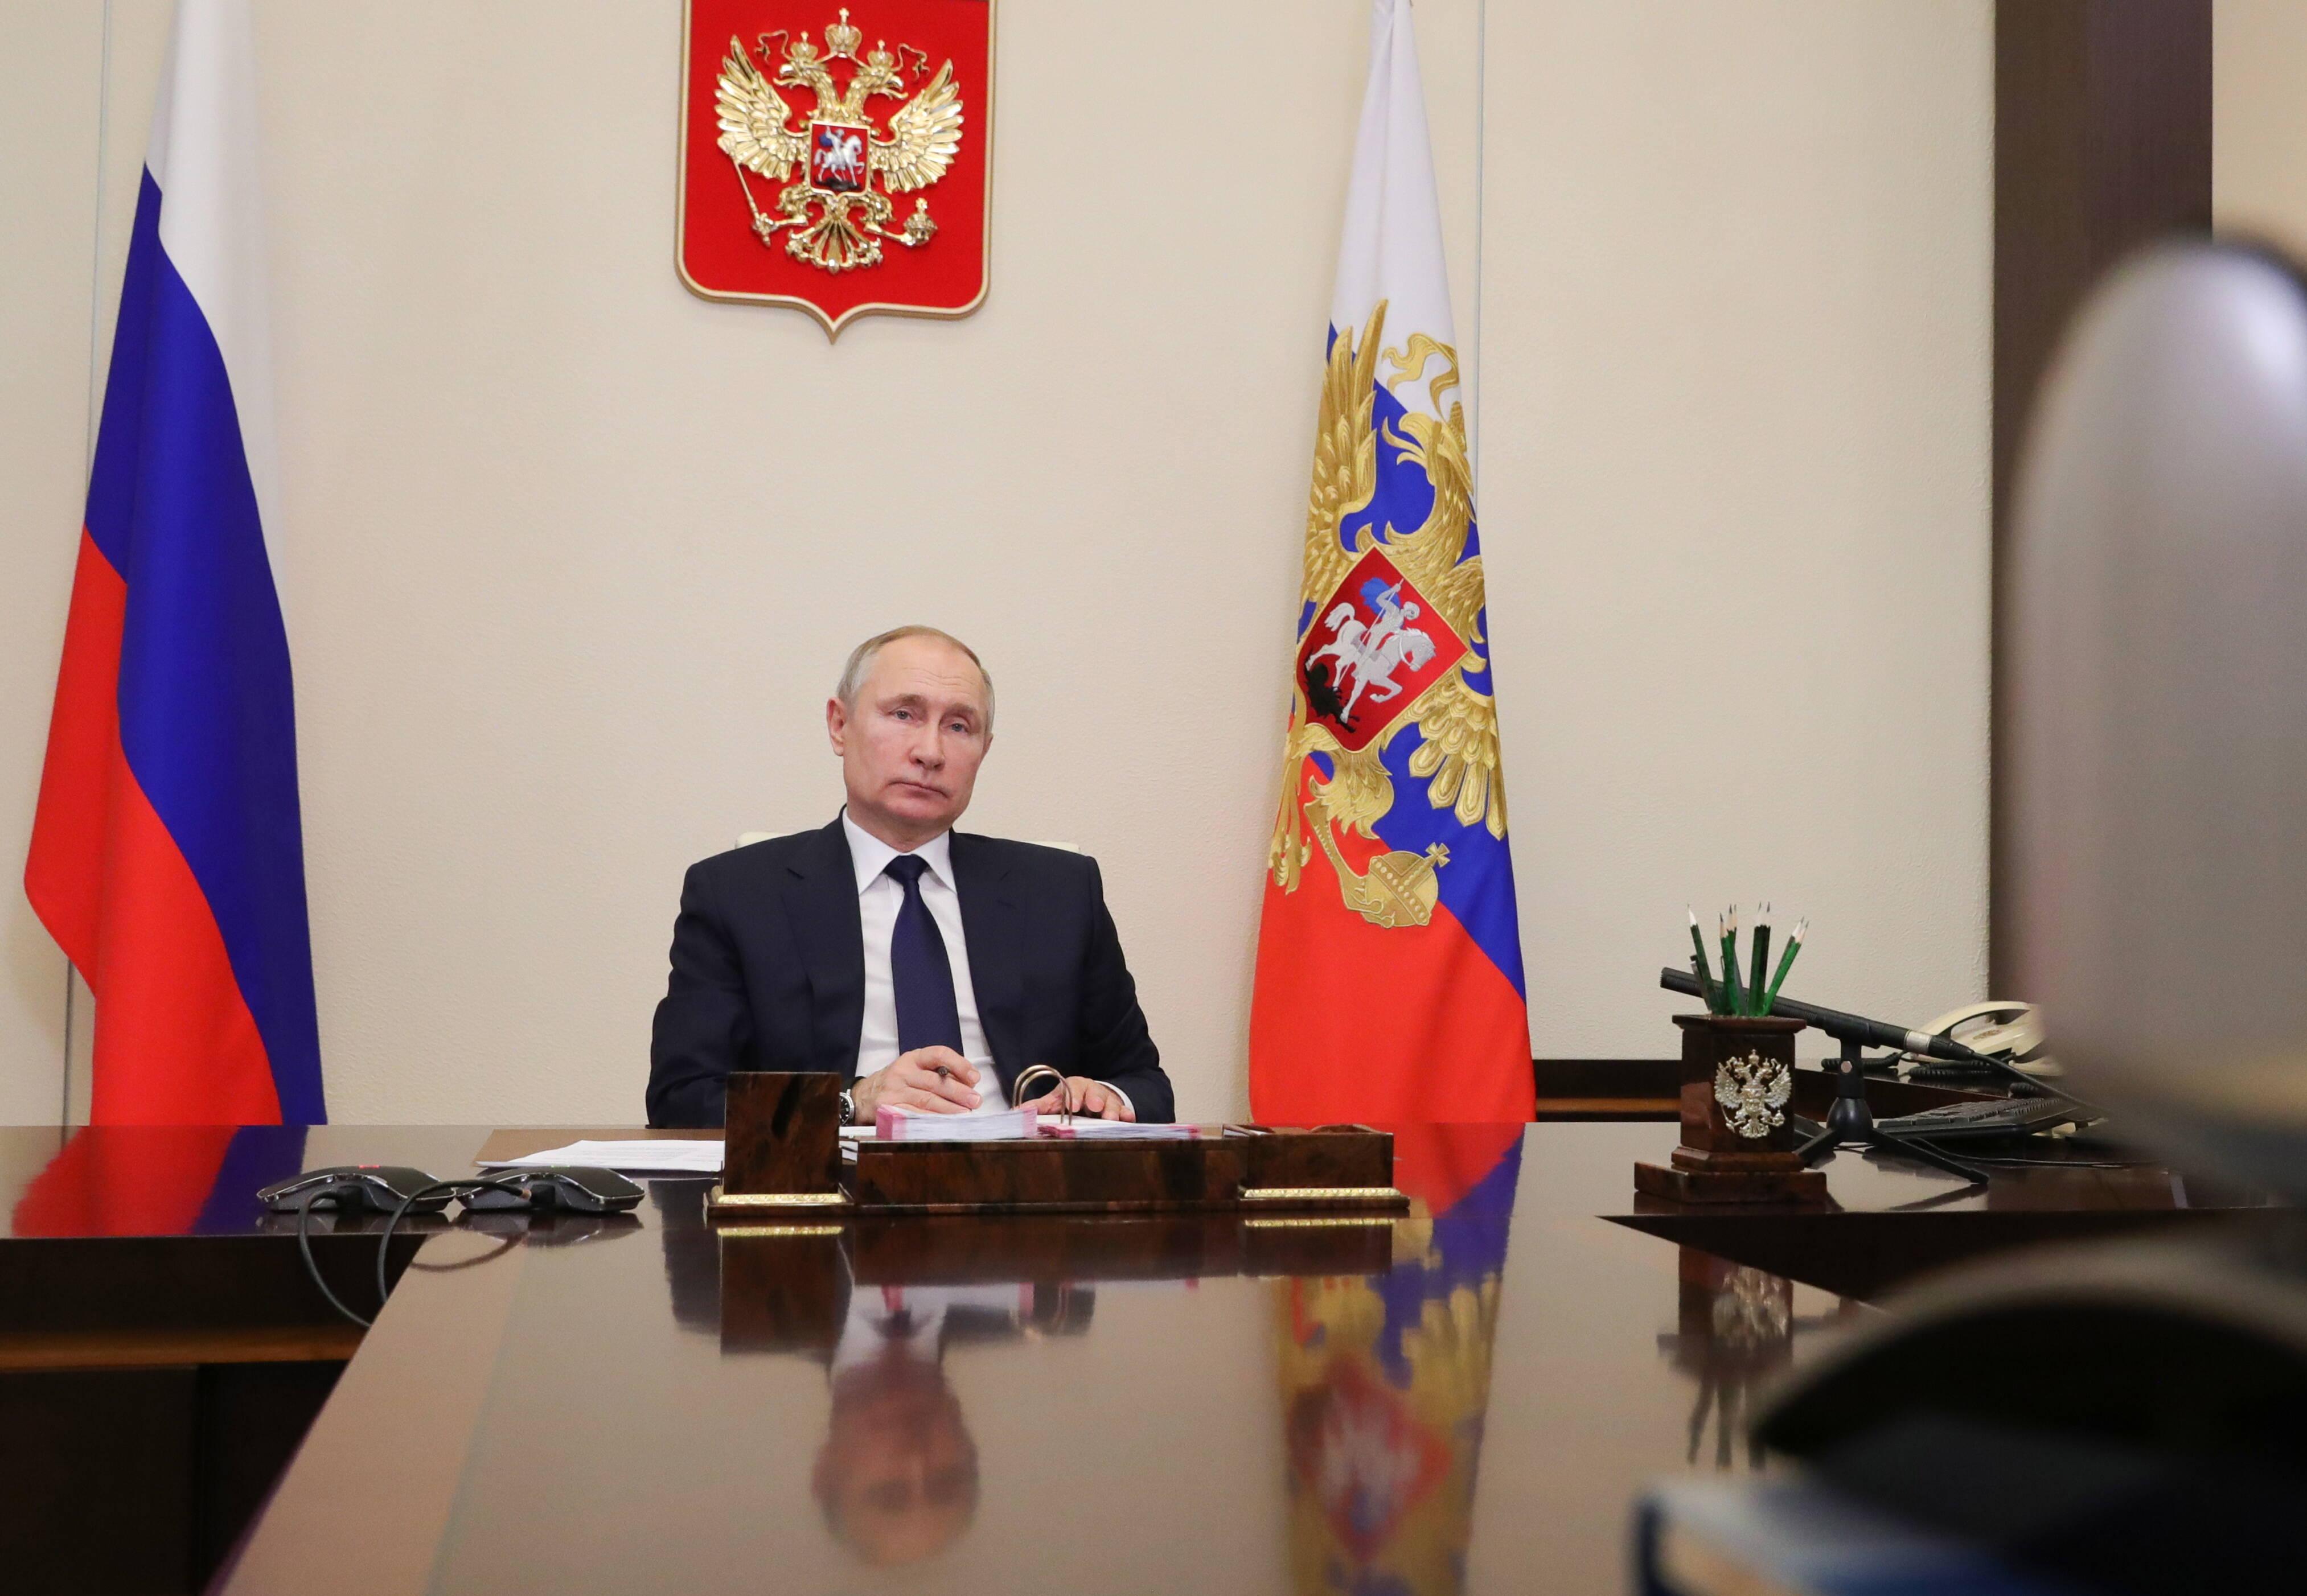 Putin's Dictatorship